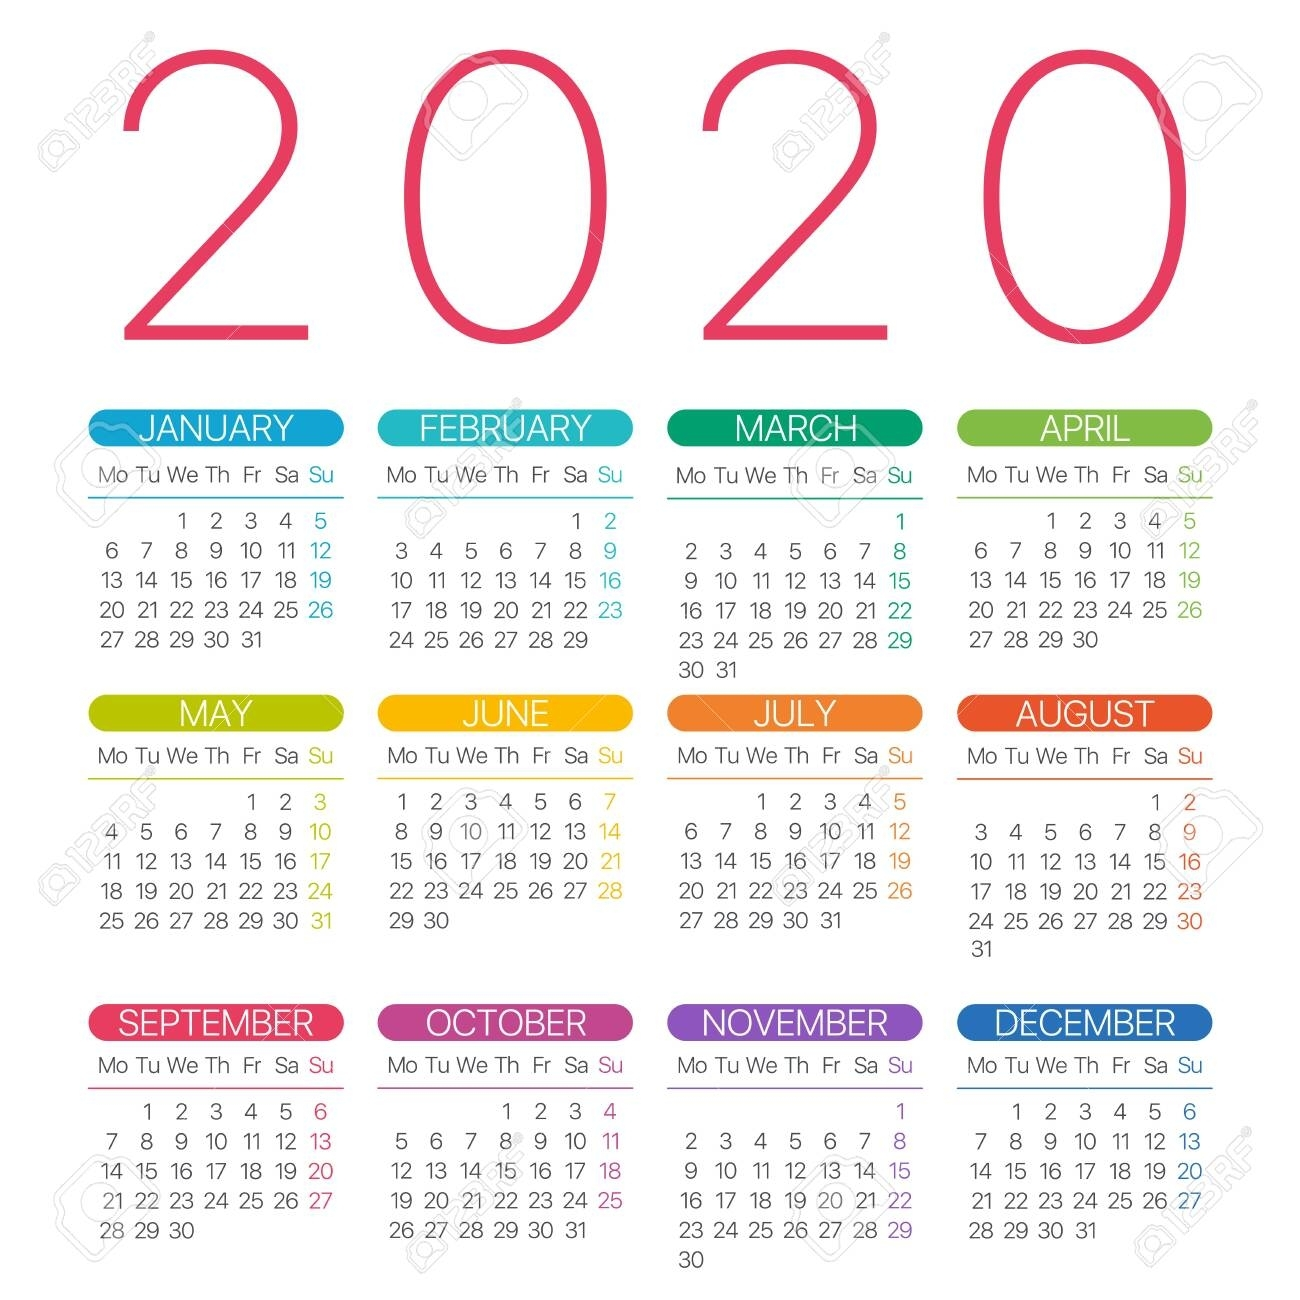 2020 Calendar Thin Line - Monday To Sunday - Vector Template pertaining to Monday To Sunday 2020 Calendar